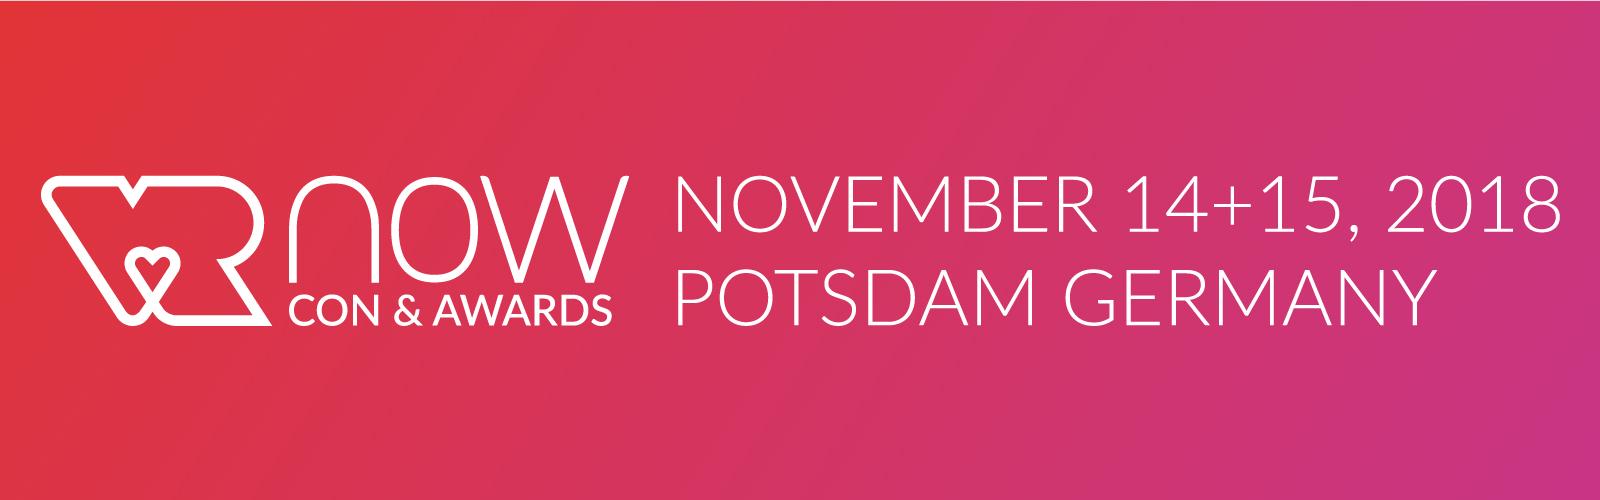 vr now con 2018 Potsdam